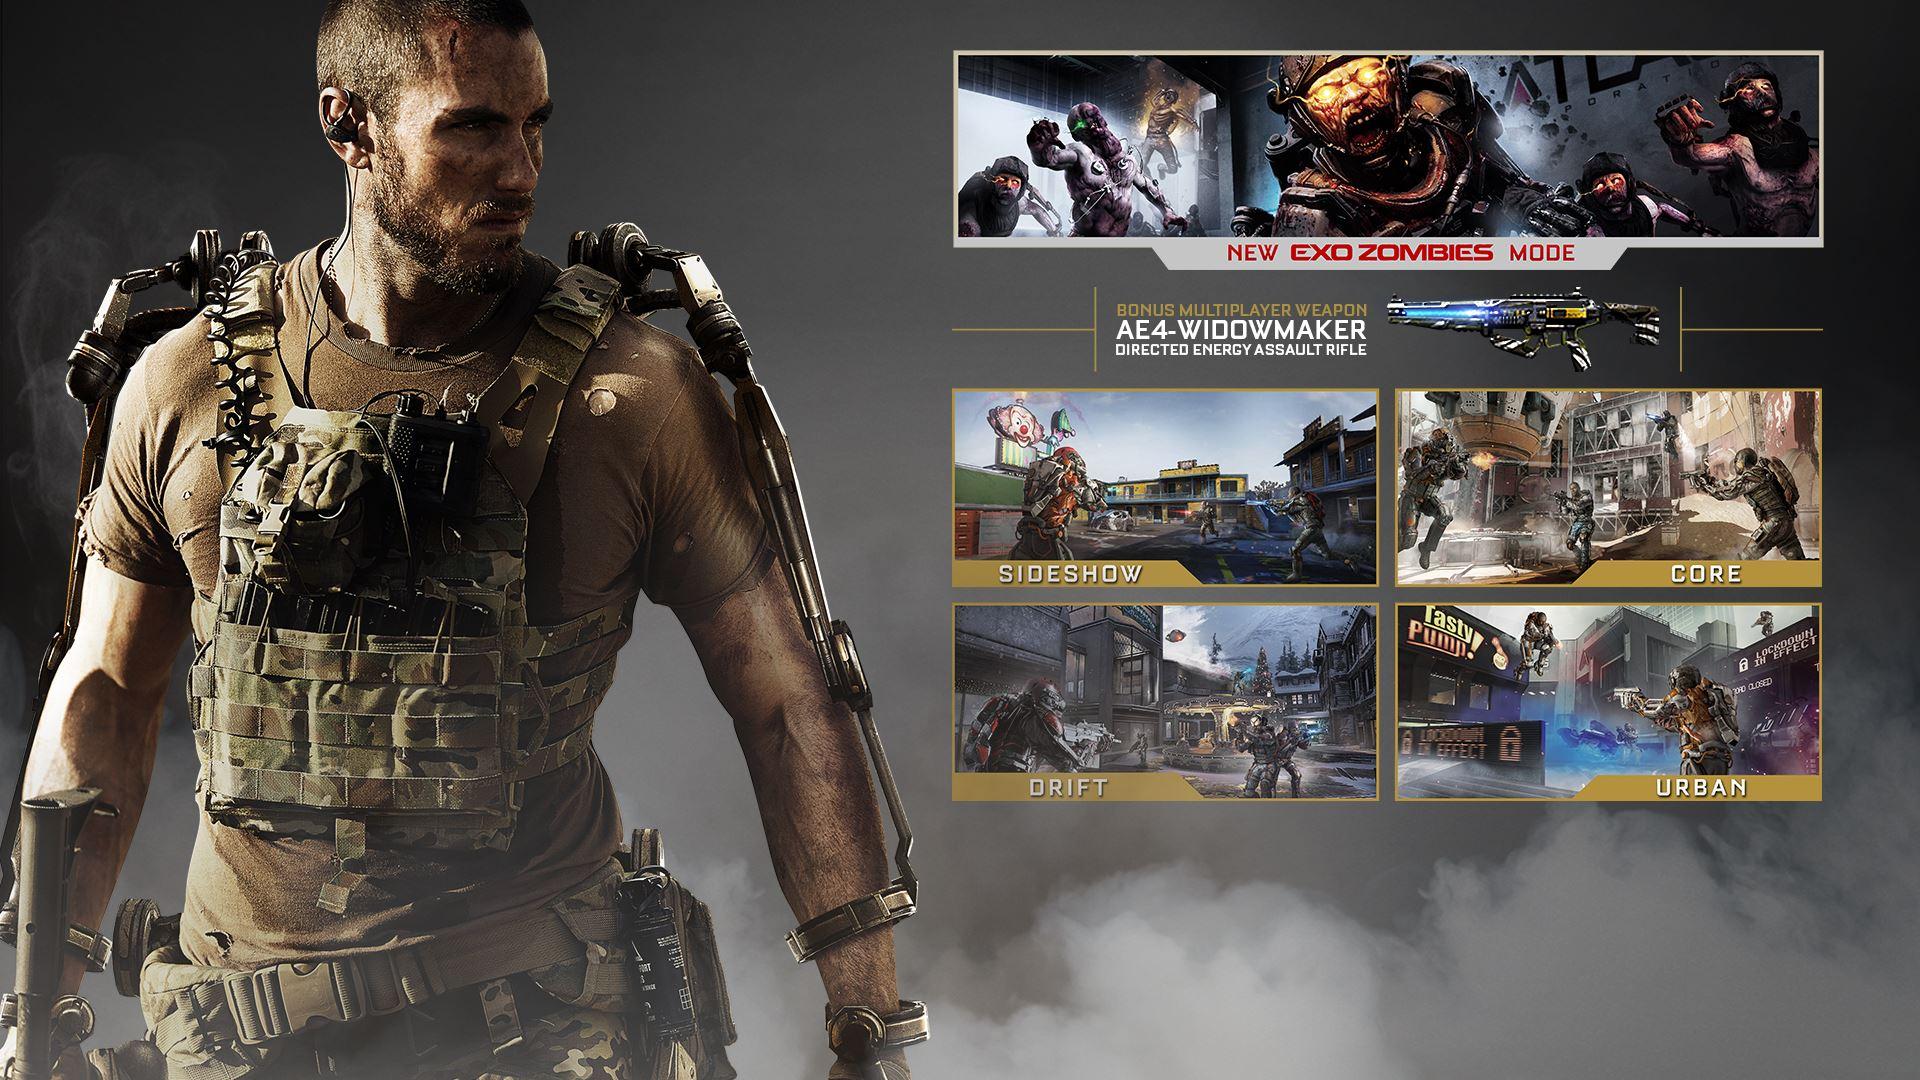 Call of Duty: Advanced Warfare HAVOC y su tráiler de ... Call Of Duty Advanced Warfare Havoc Zombies